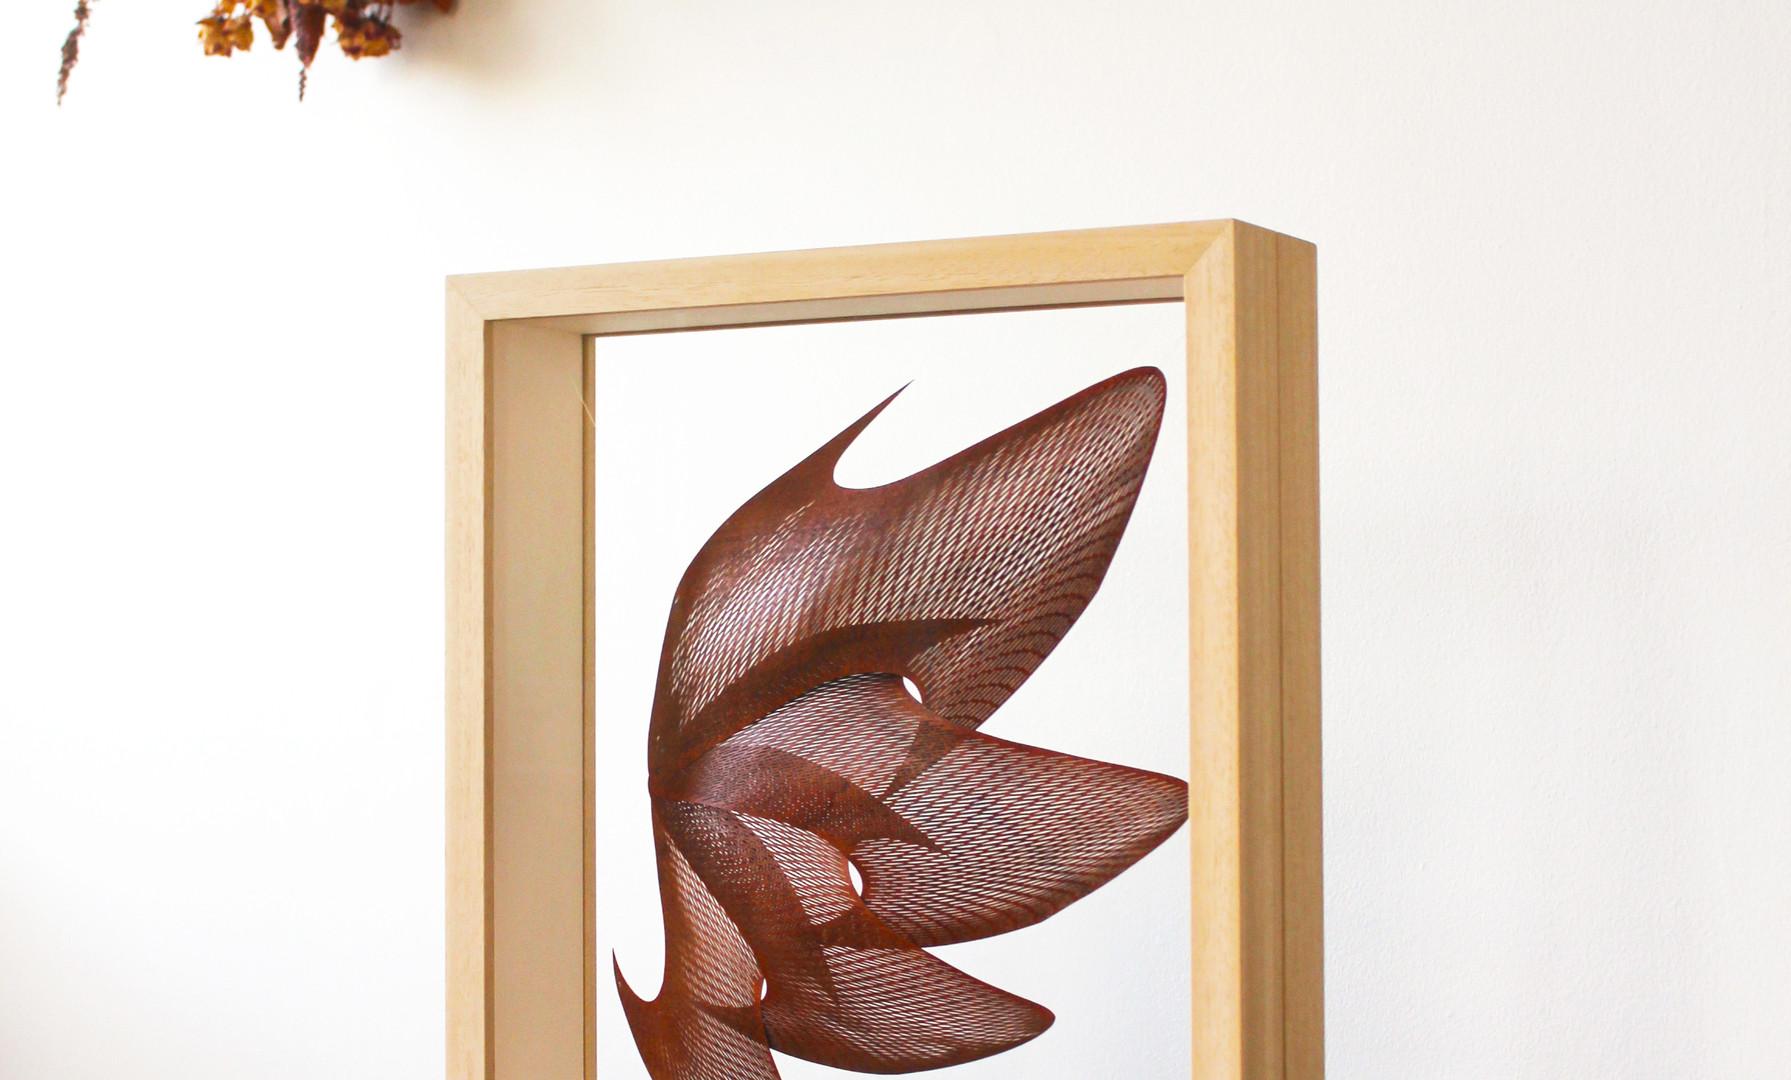 Double-sided glass frame  w)35cm x h)42cm x d)9cm